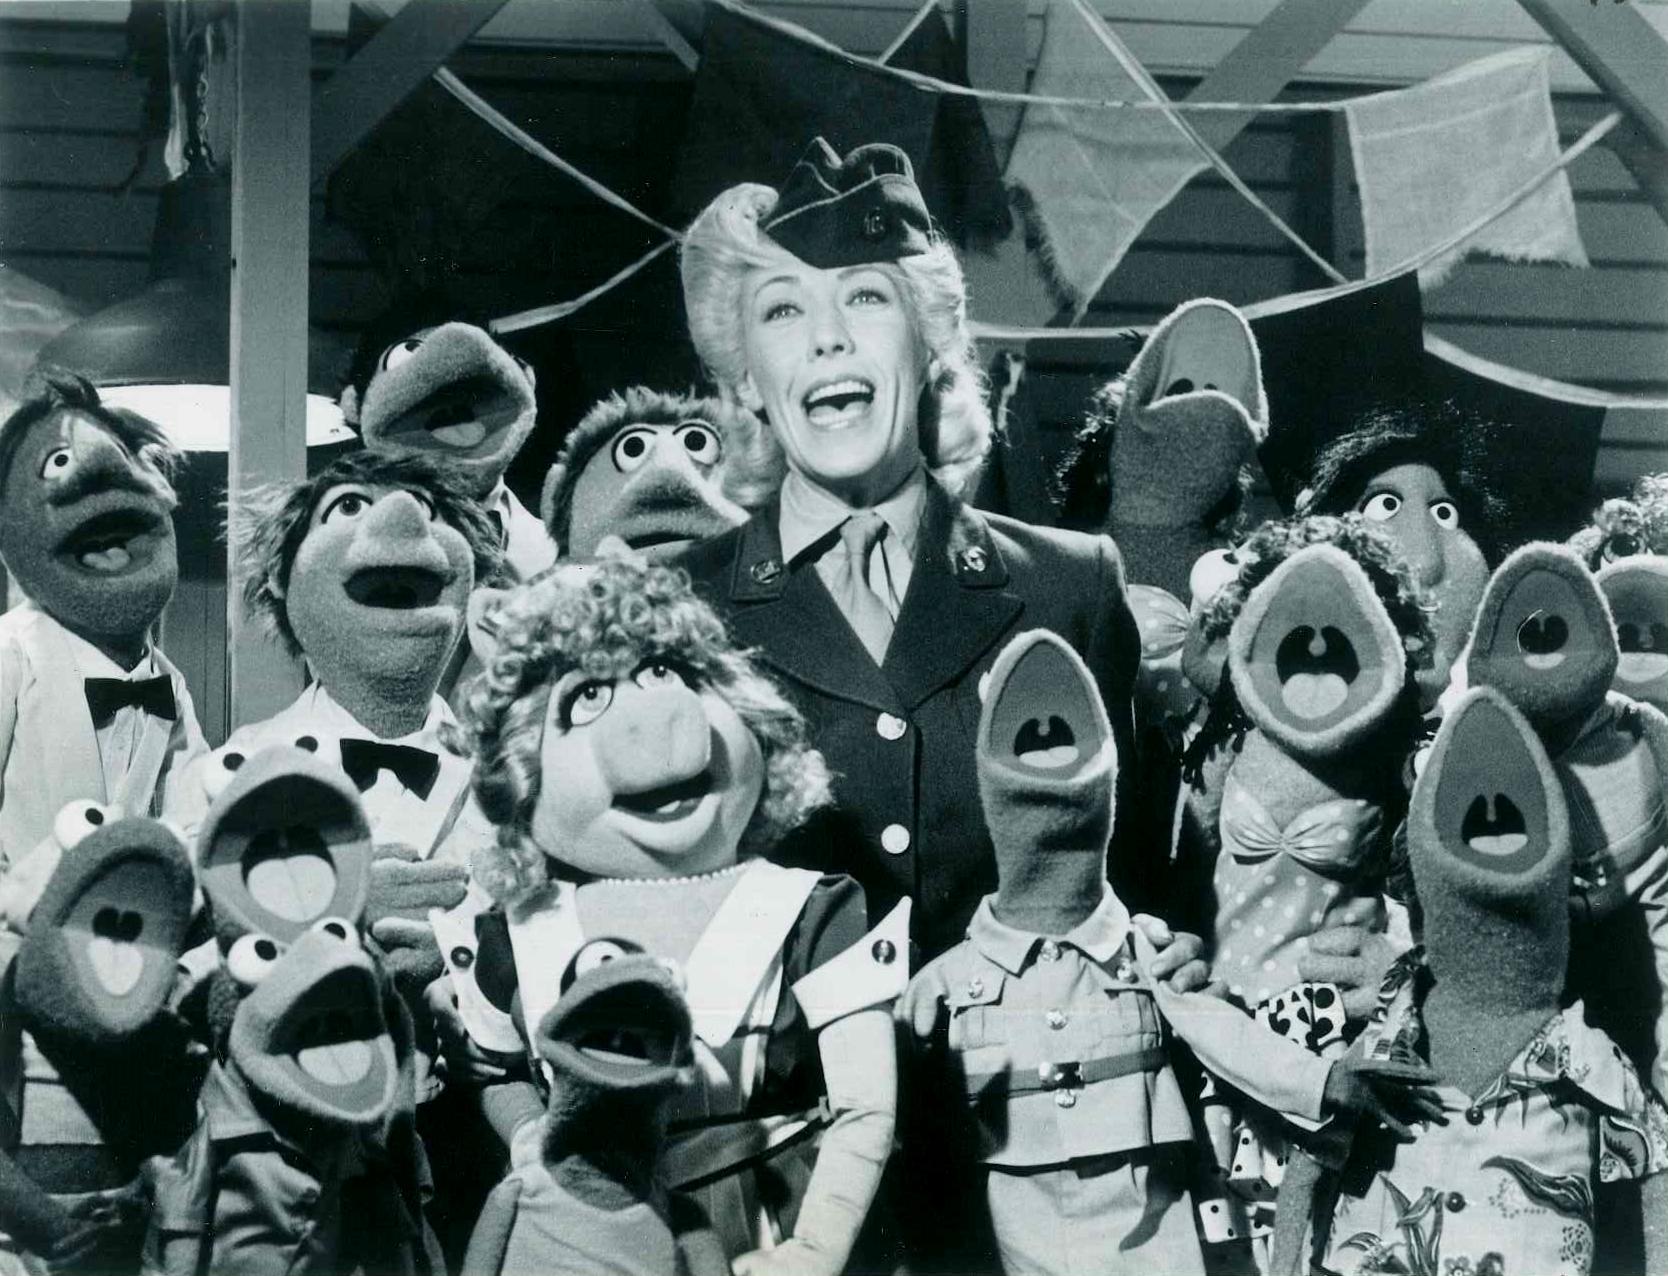 File:Tomlin muppets.jpg